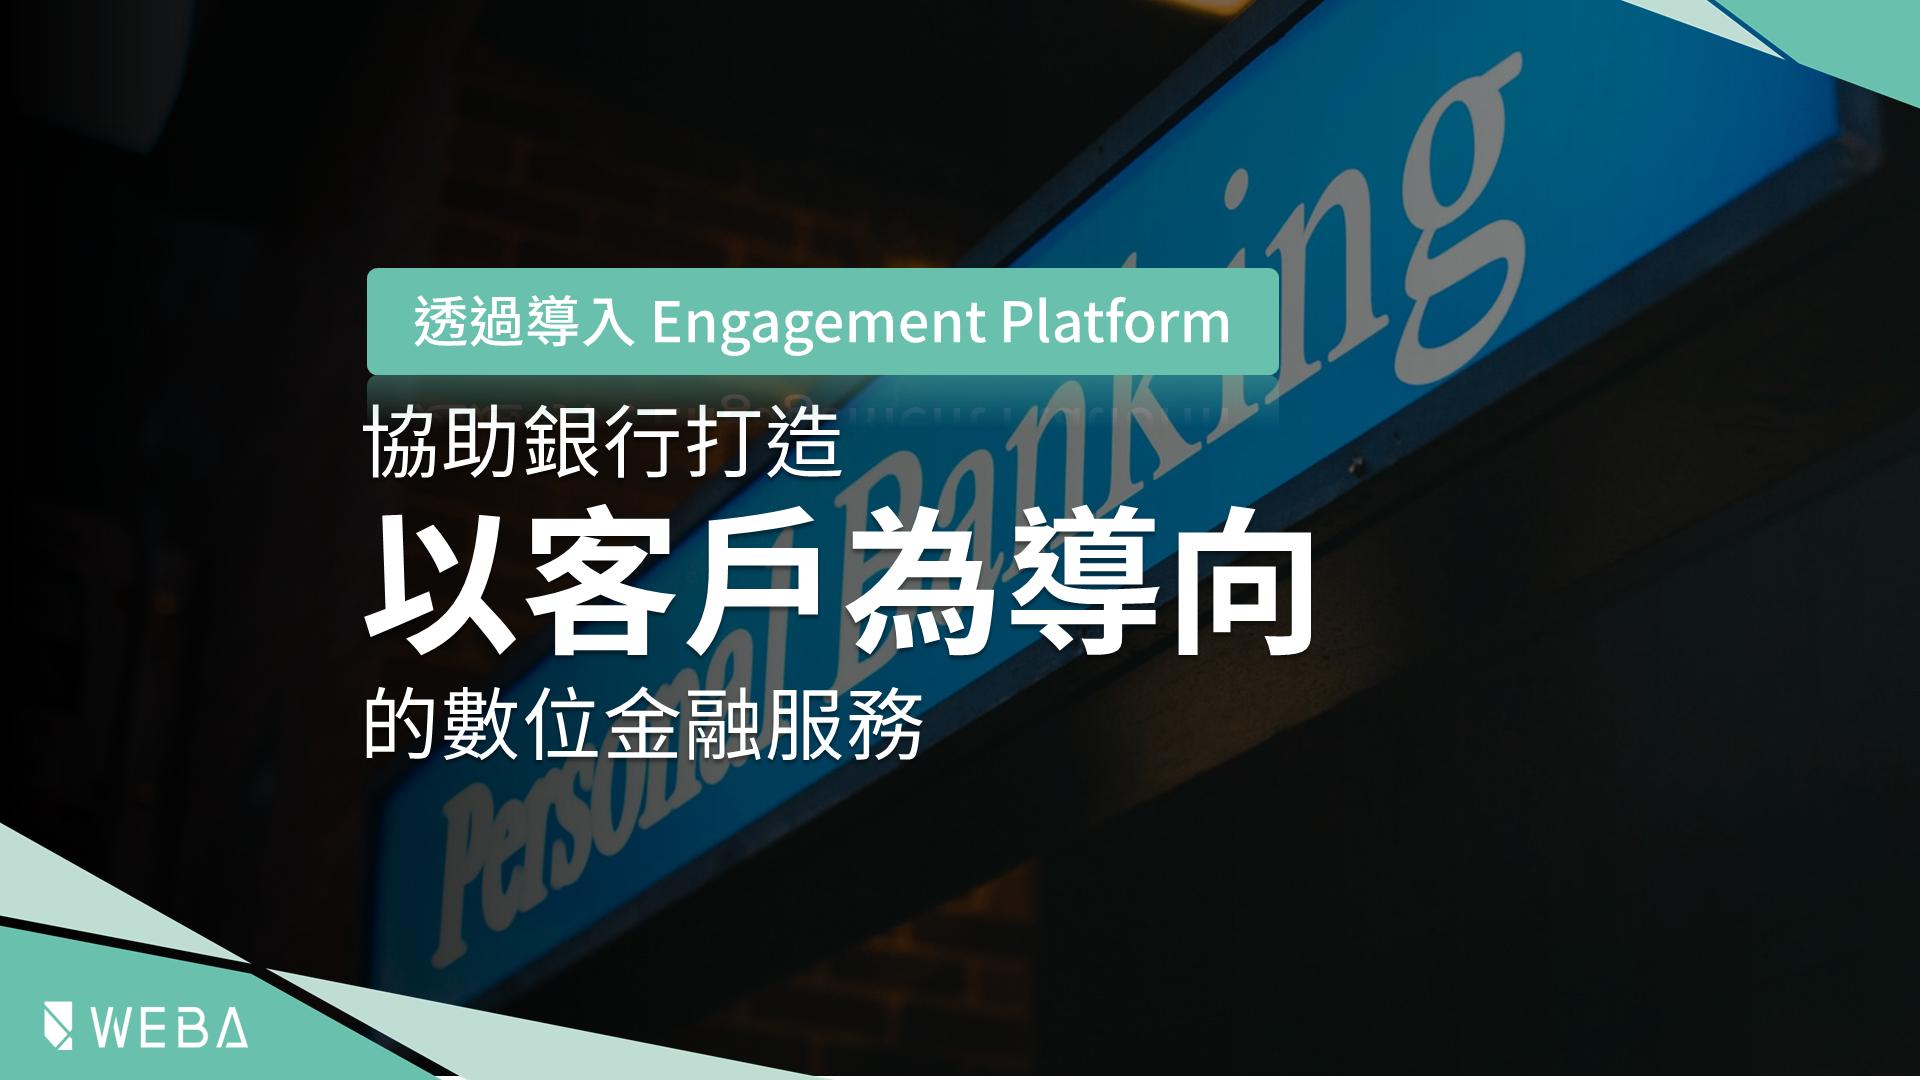 Engagement Platform 銀行 客戶導向 數位金融服務